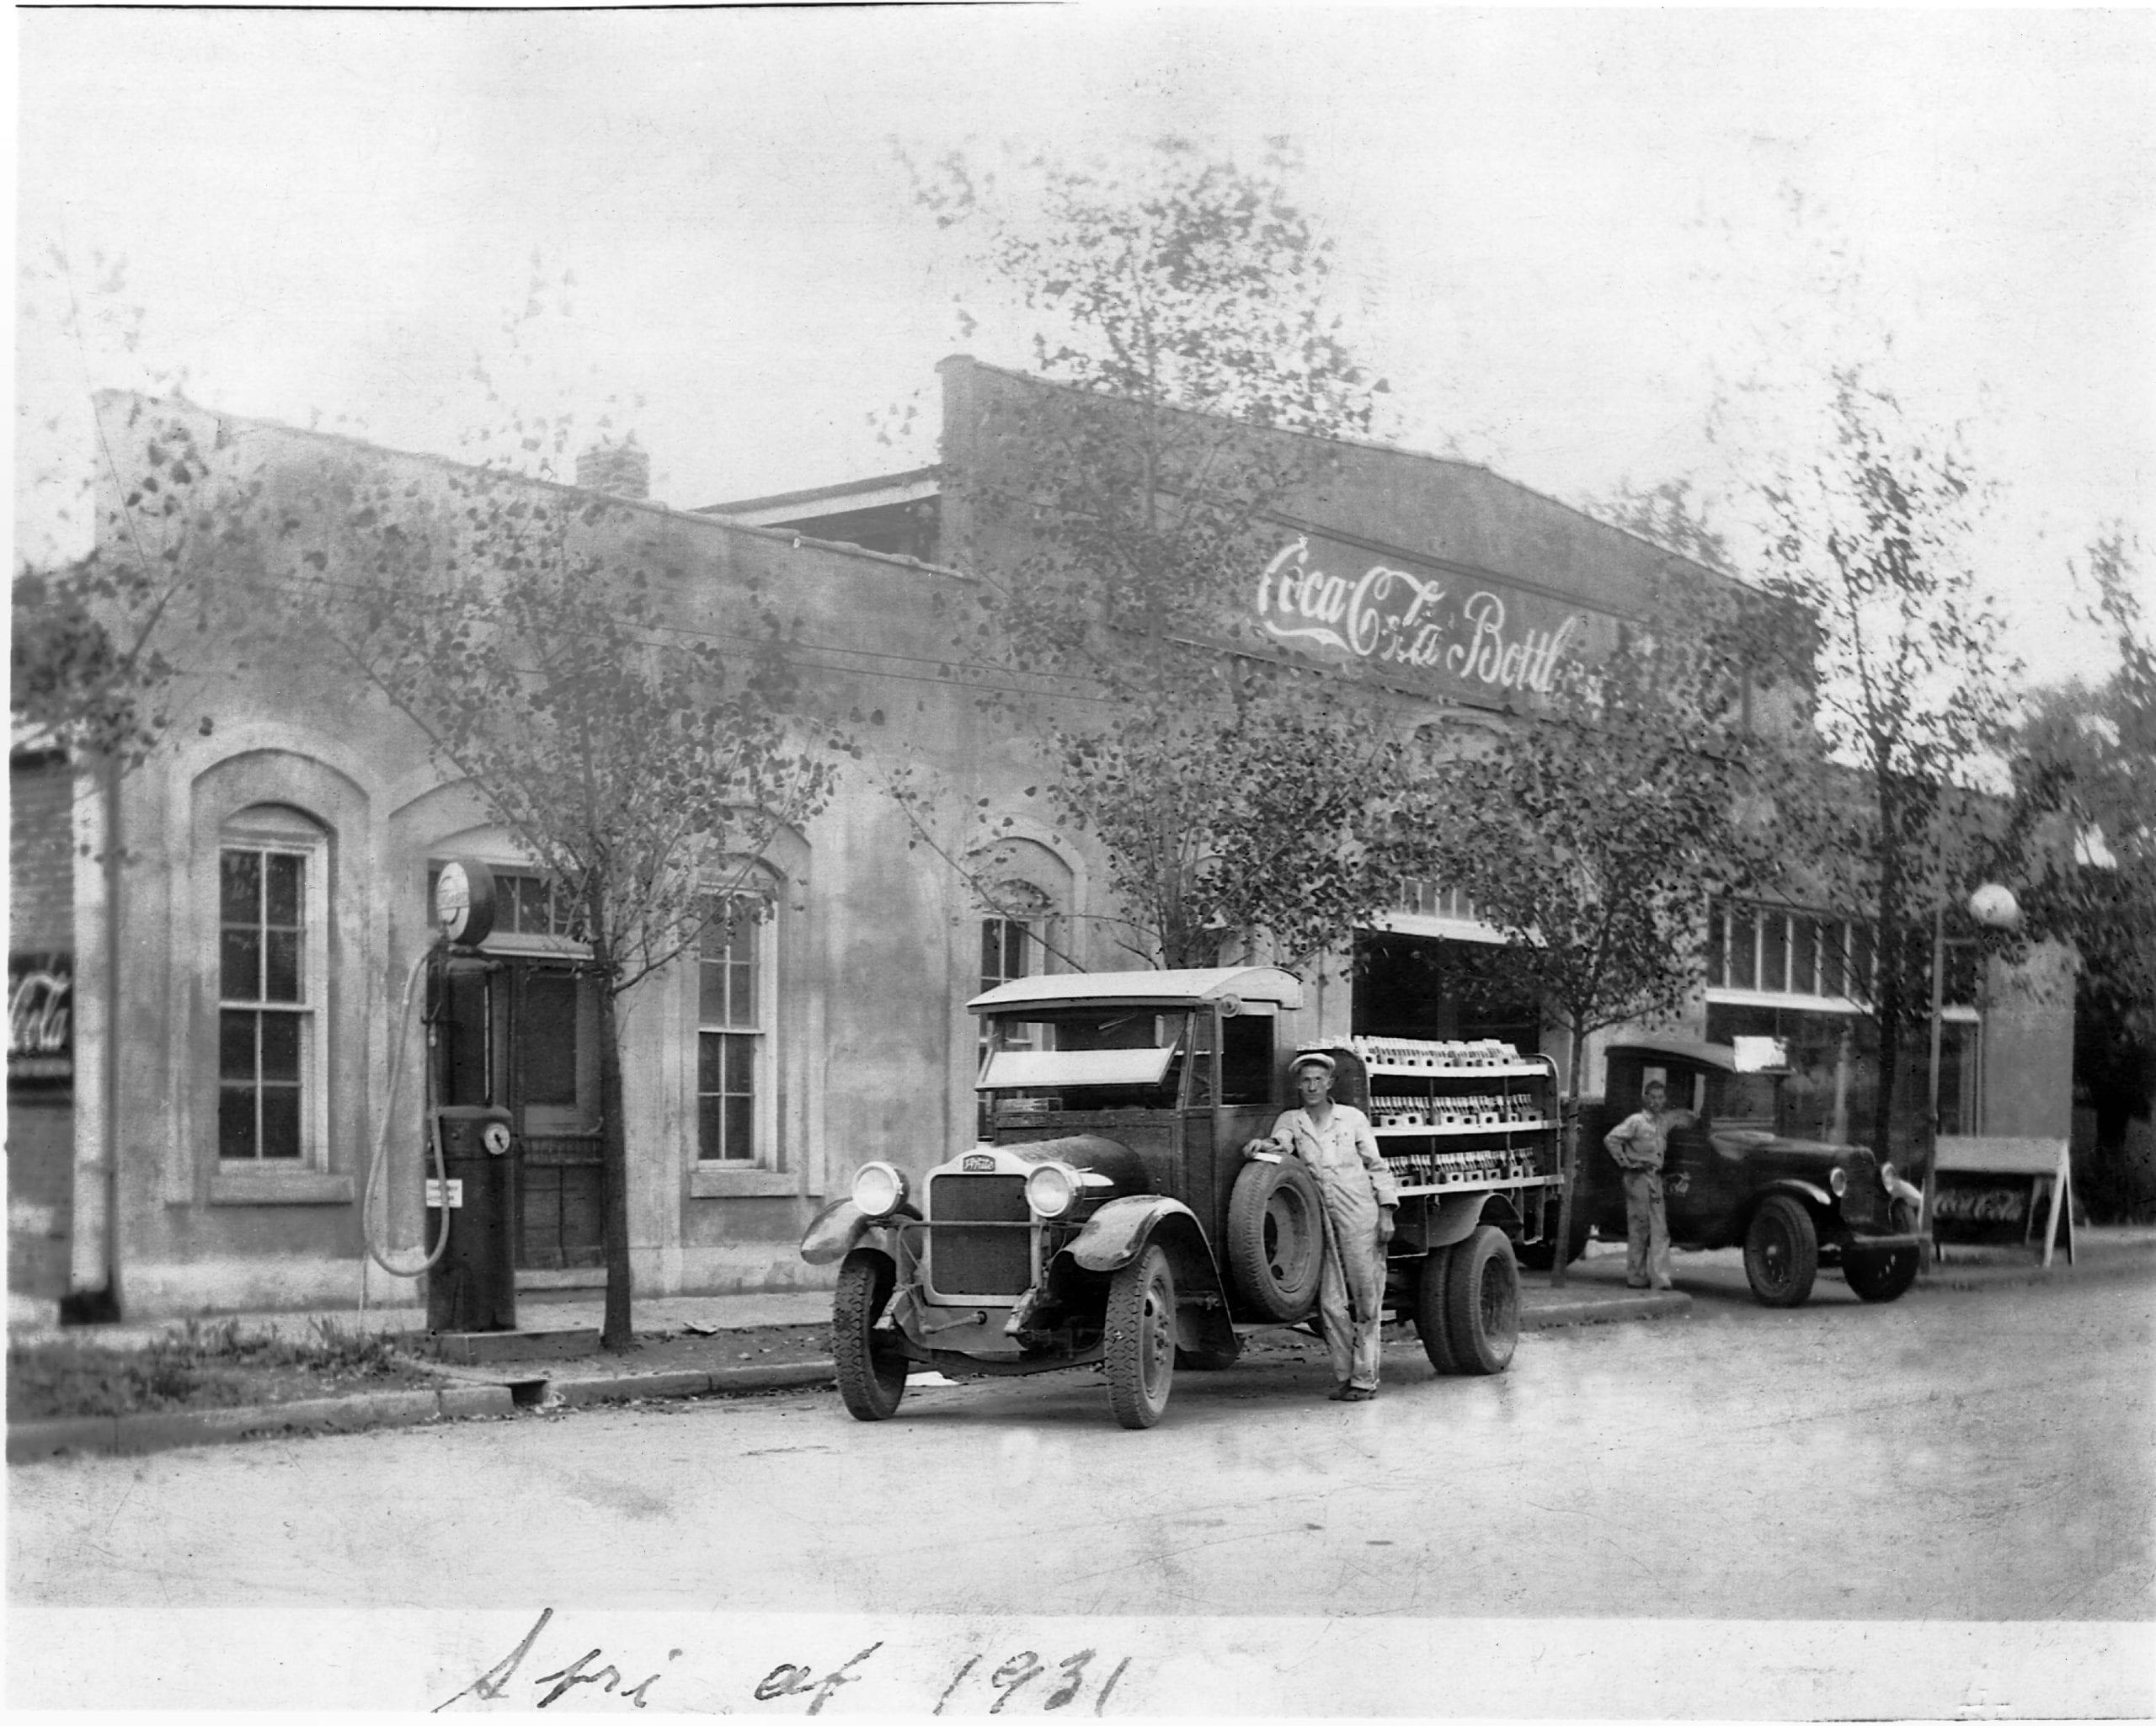 1931 – Coca Cola